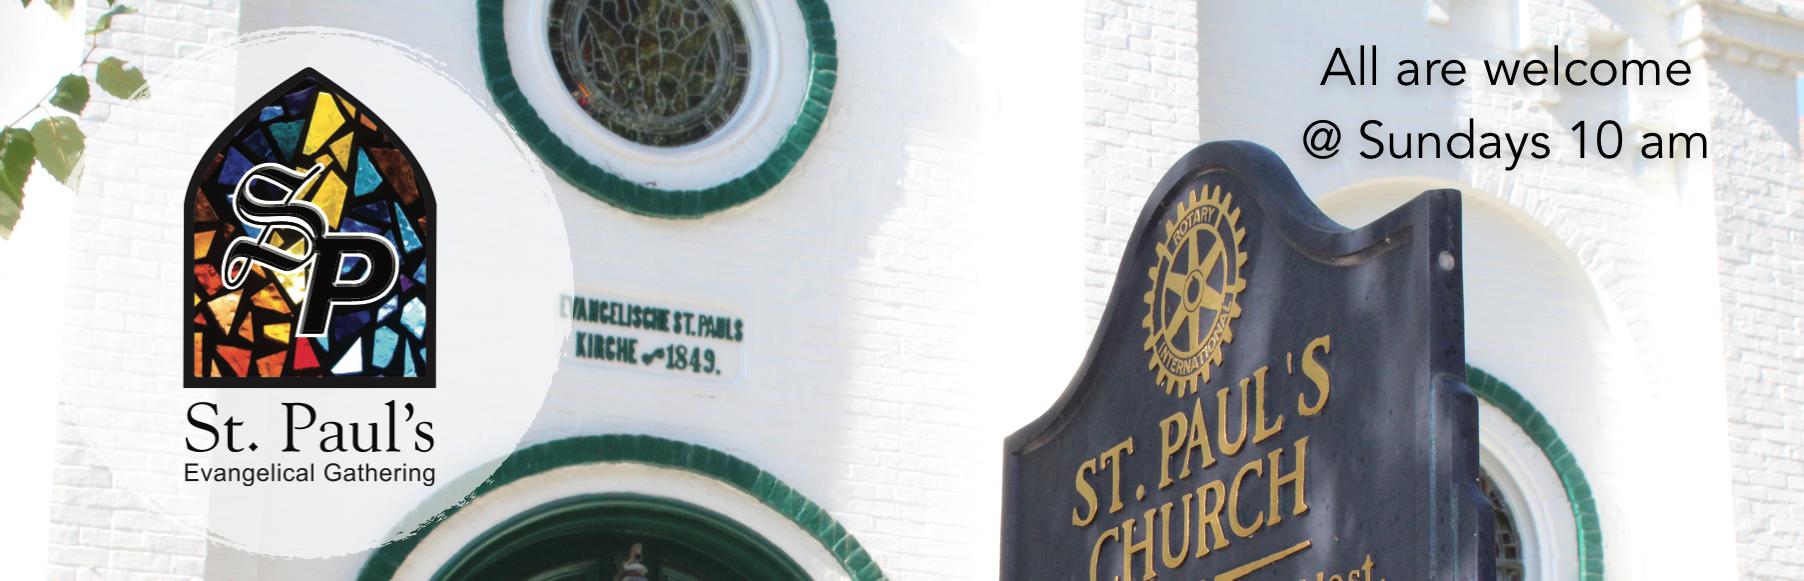 St. Paul's Evangelical Church